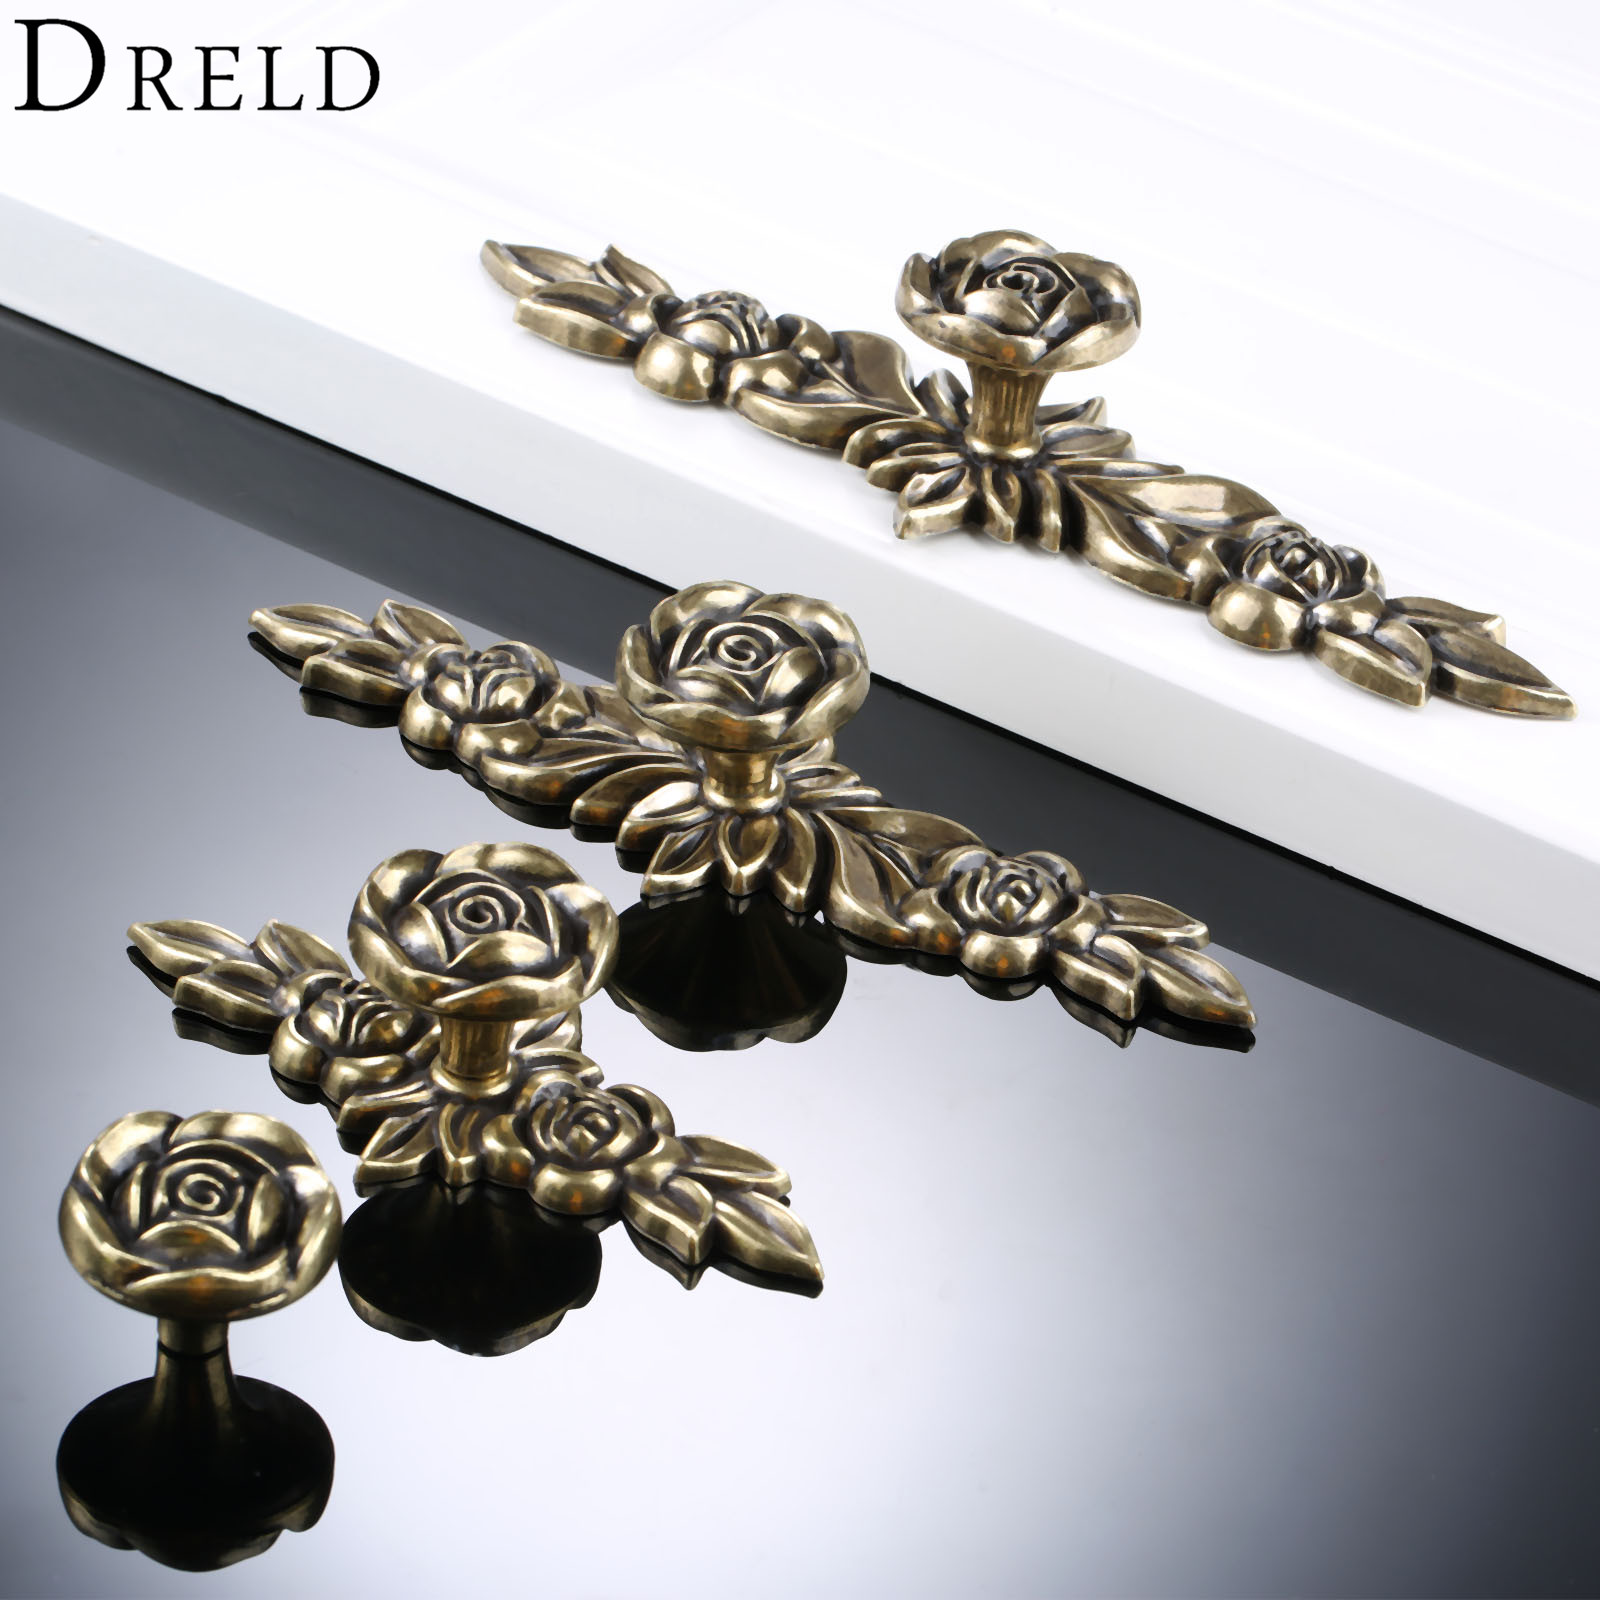 Image of: Big Sale 26a1 Dreld Furniture Handles European Style Wardrobe Drawer Knobs Kitchen Cabinet Door Pull Retro Classical Bronze Rose Flower Shape Cicig Co